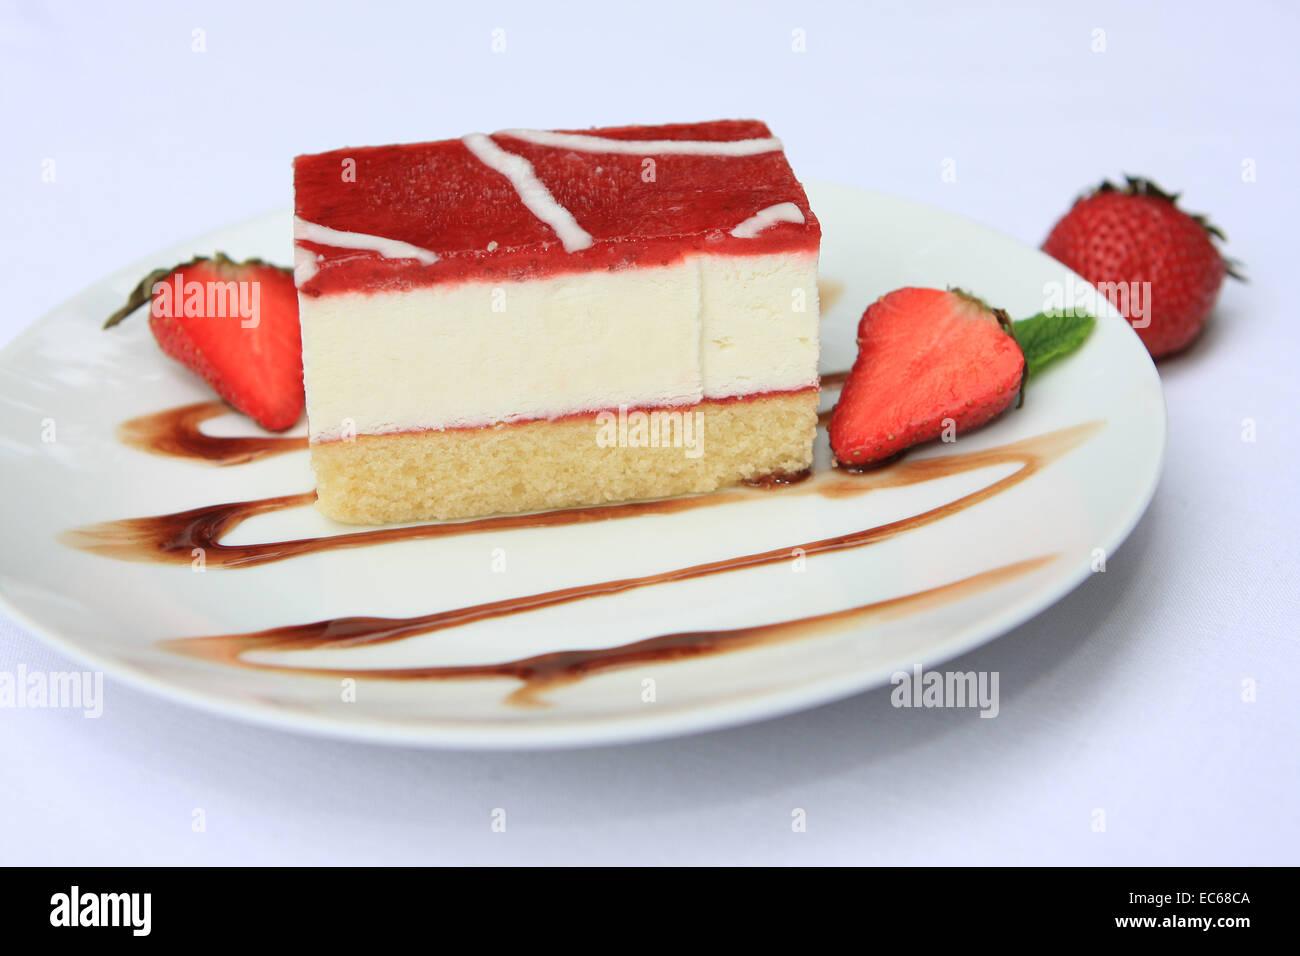 Erdbeer Quark Kuchen Stockfoto Bild 76355674 Alamy